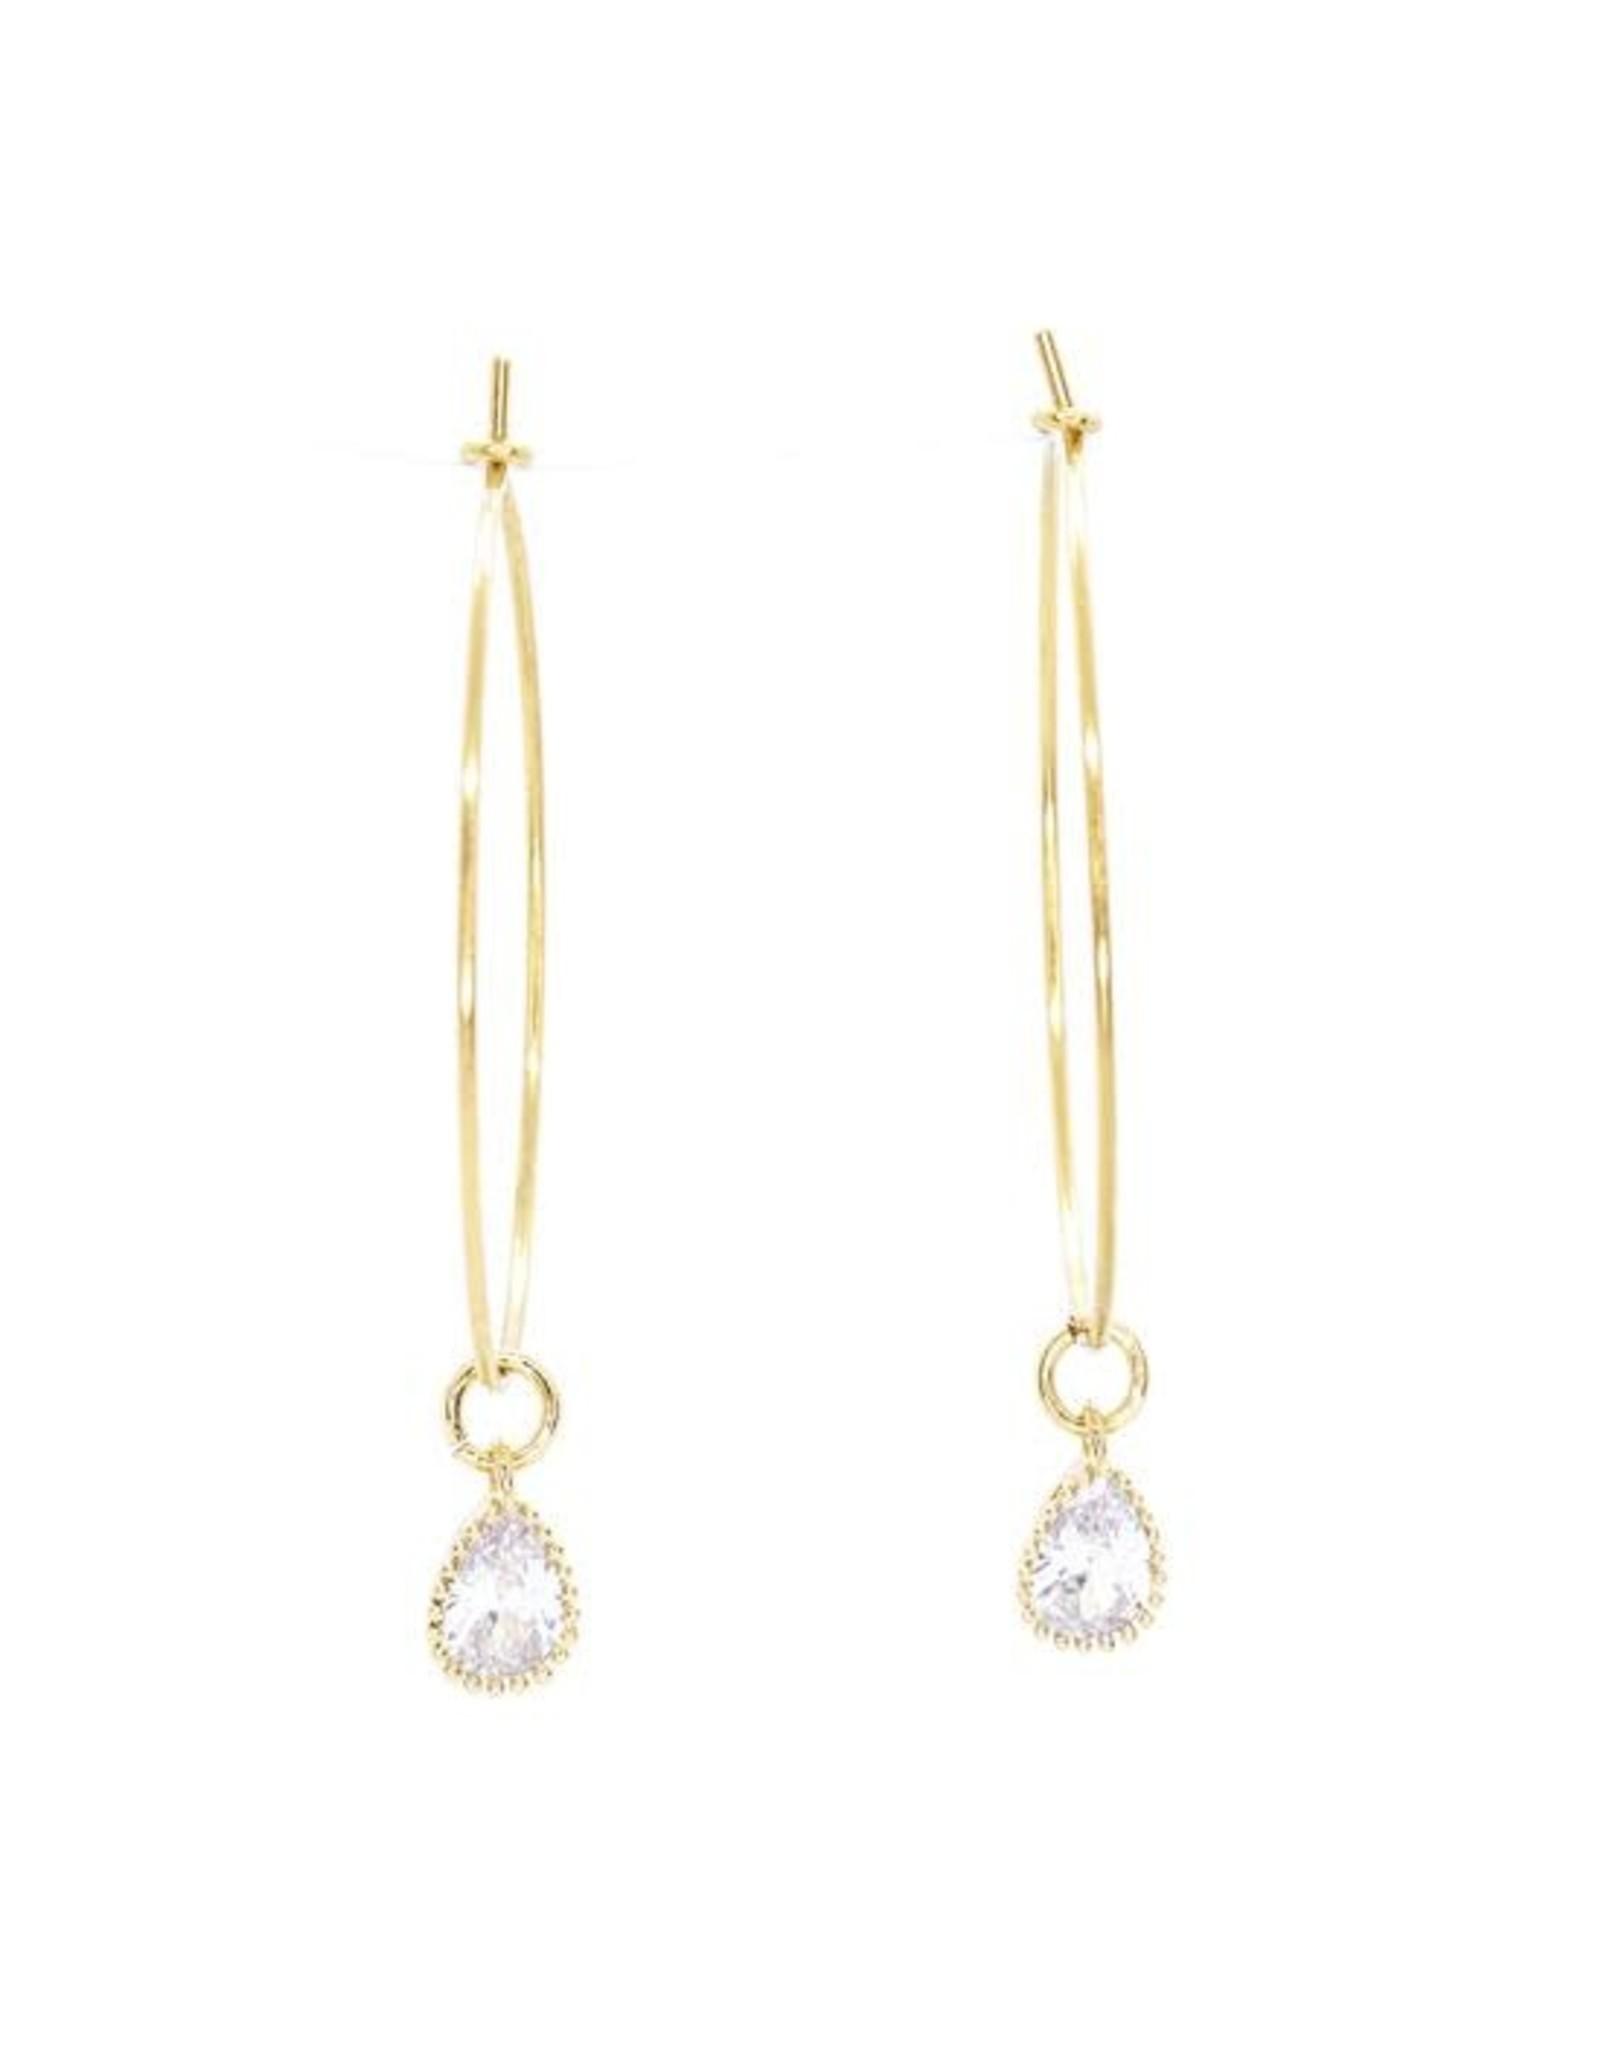 Salty Cali Shine Like a Diamond Hoops - Salty Pendants - gold plating